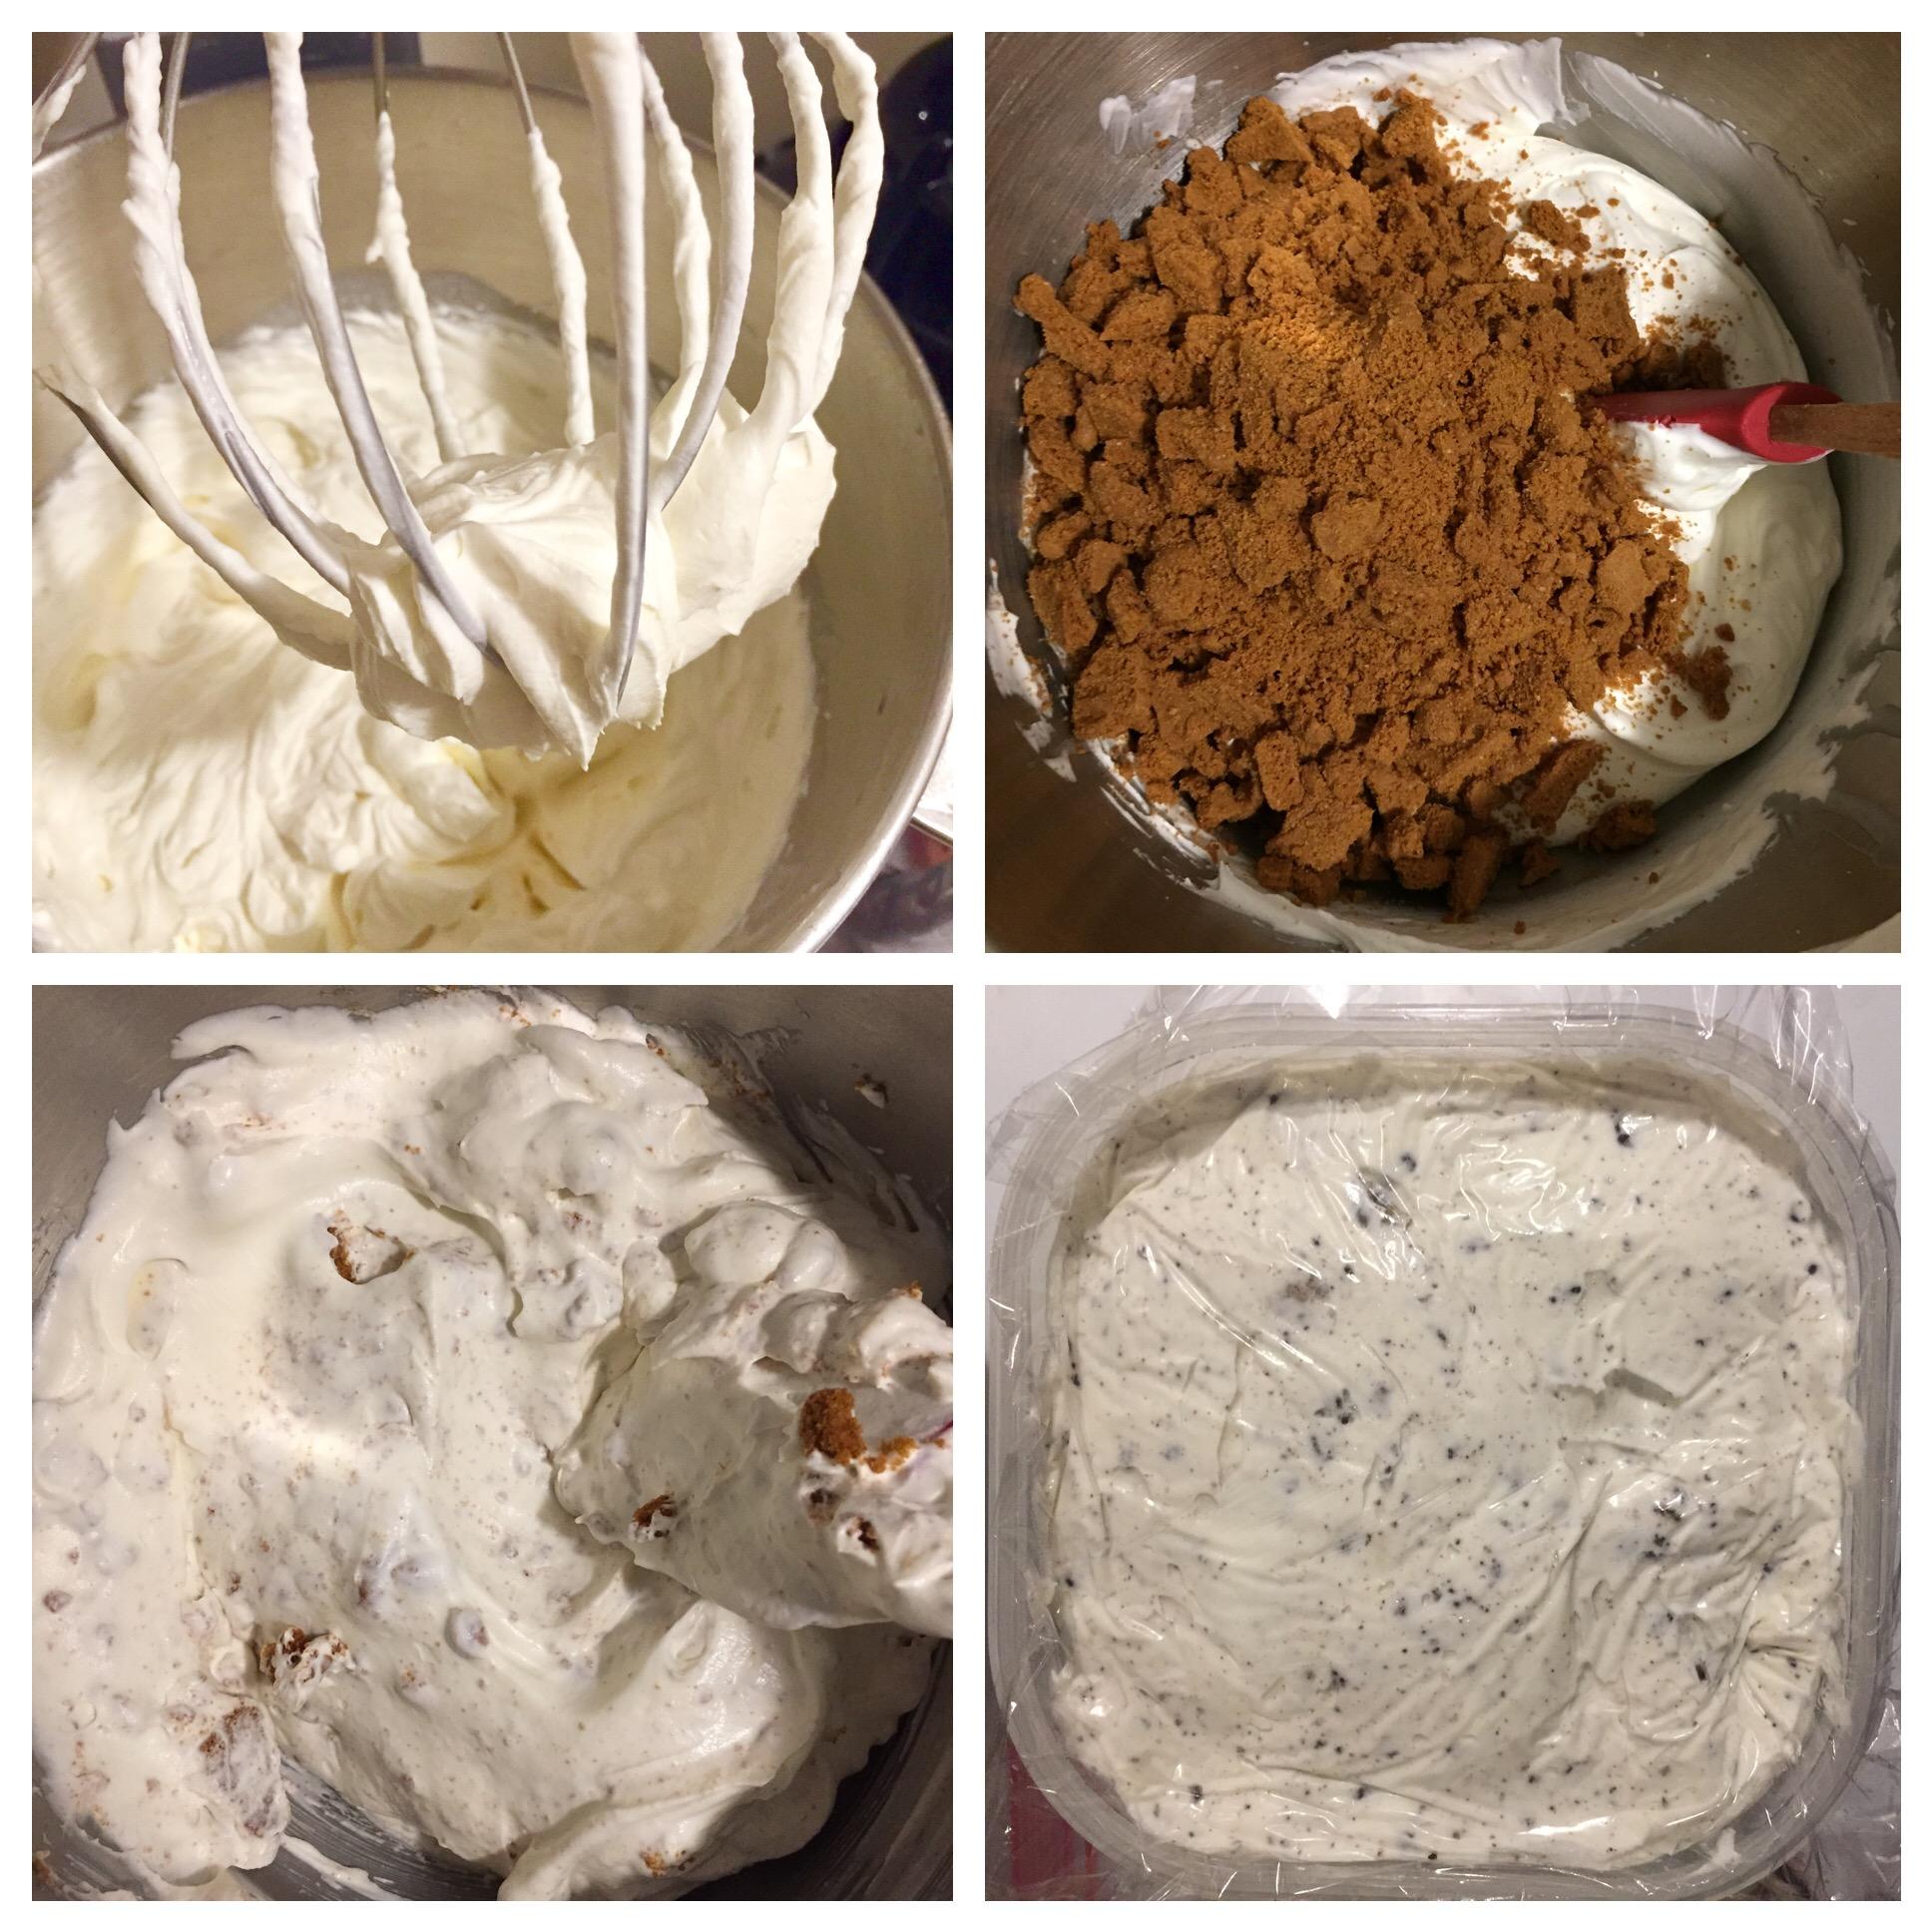 Biscoff cookies and cream ice cream